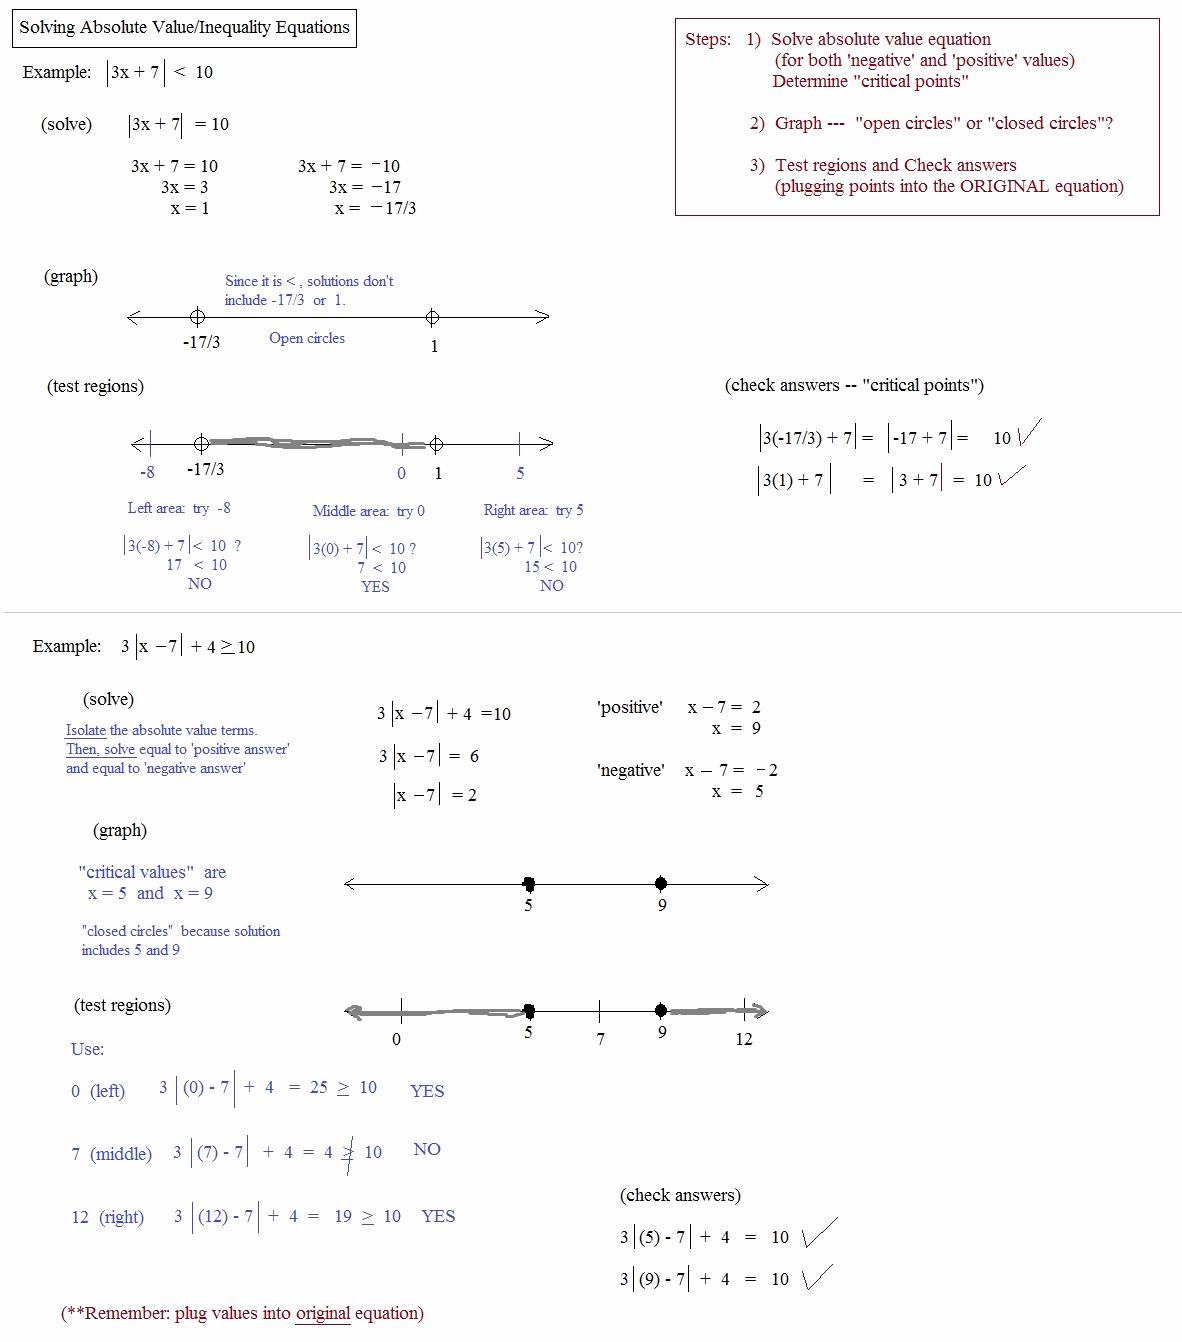 50 Absolute Value Inequalities Worksheet Answers